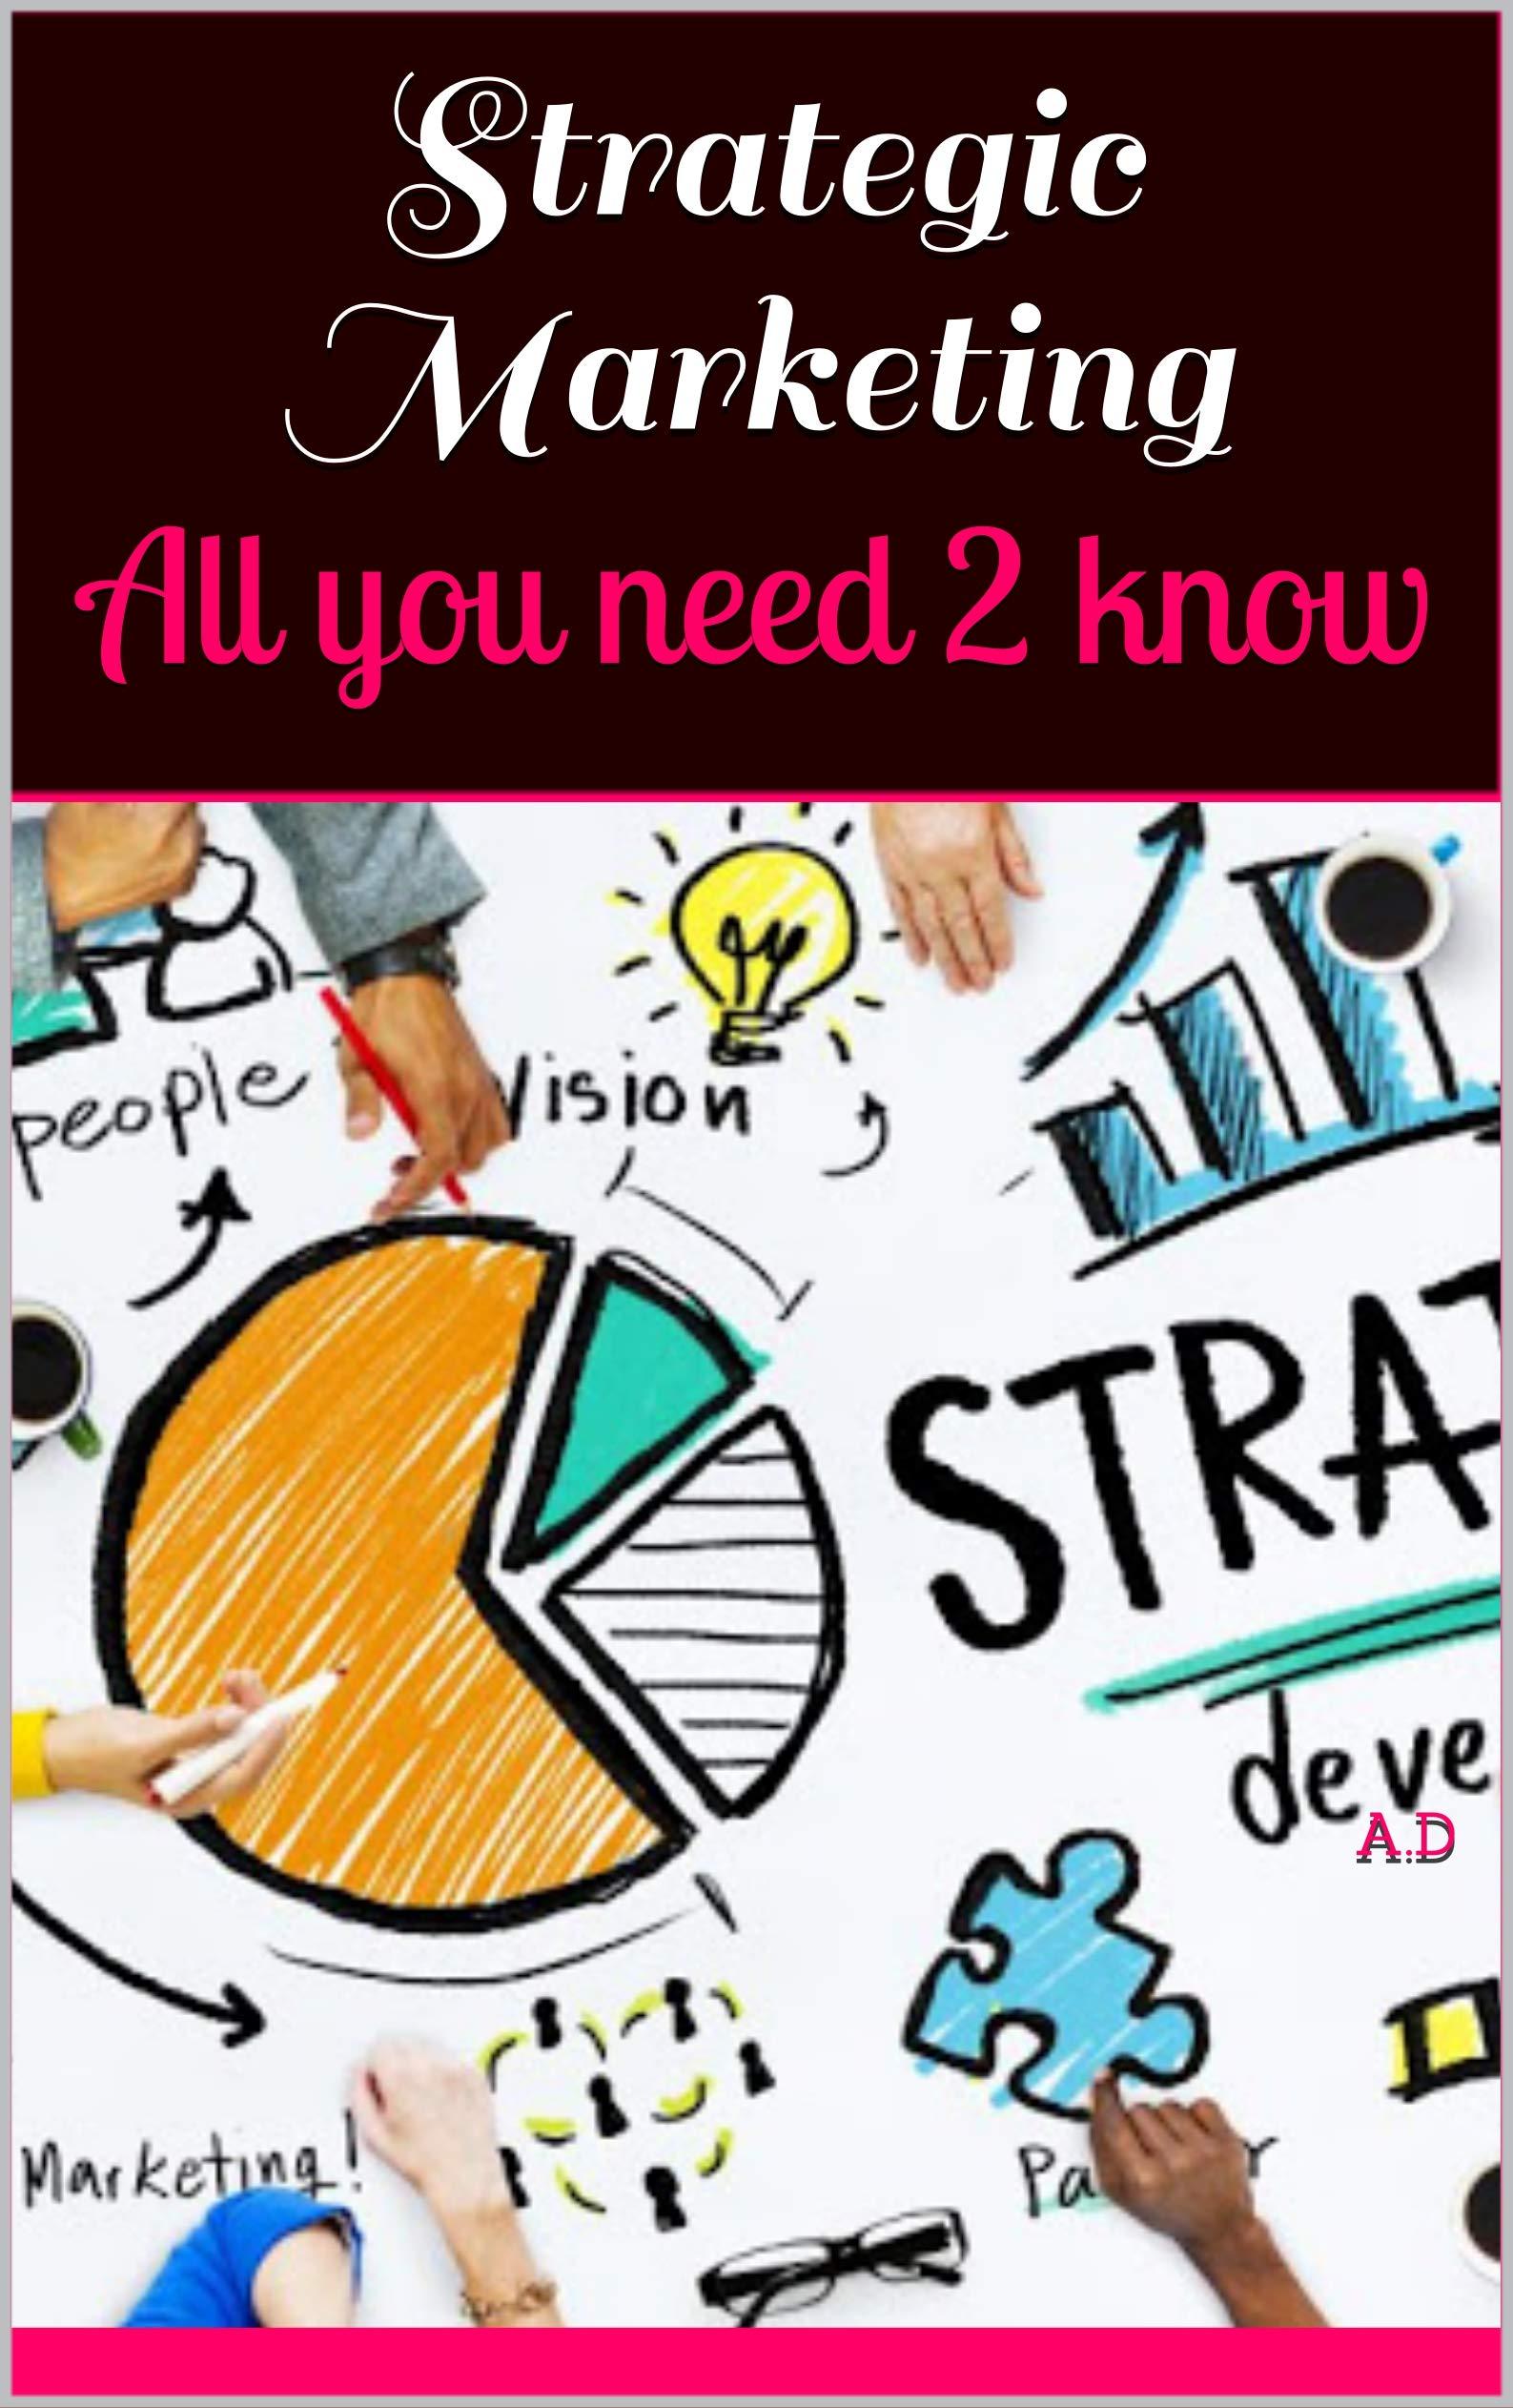 Strategic Marketing: All you need 2 know